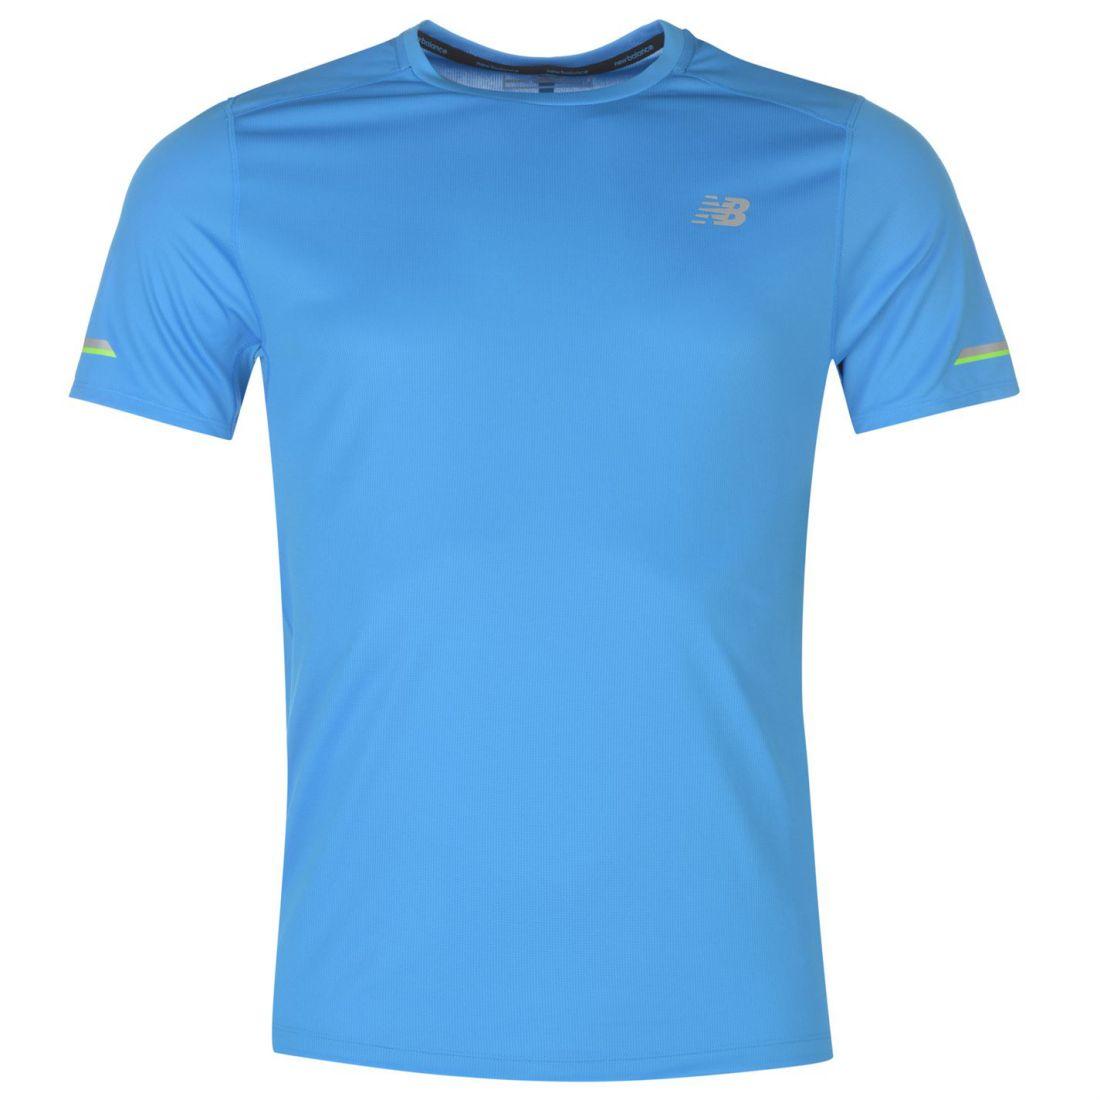 30a7c2bd29cb3 Image is loading New-Balance-Ice-Tee-Short-Sleeve-Performance-Shirt-